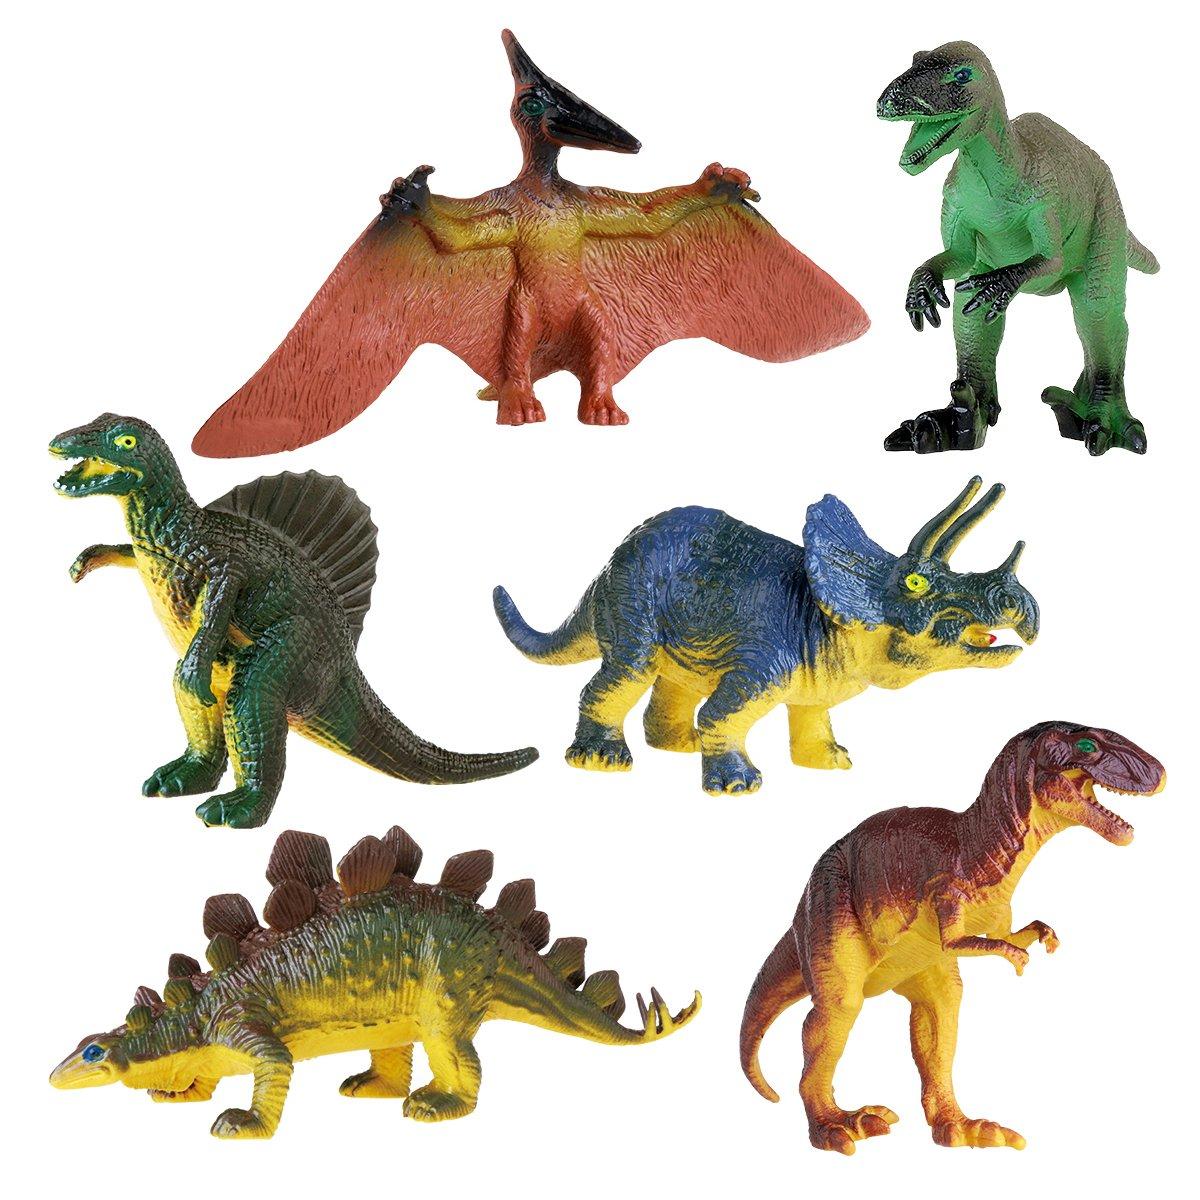 Dinosaur Toys For Toddlers : Nuolux dinosaur toy for kids tyrannosaurus stegosaurus